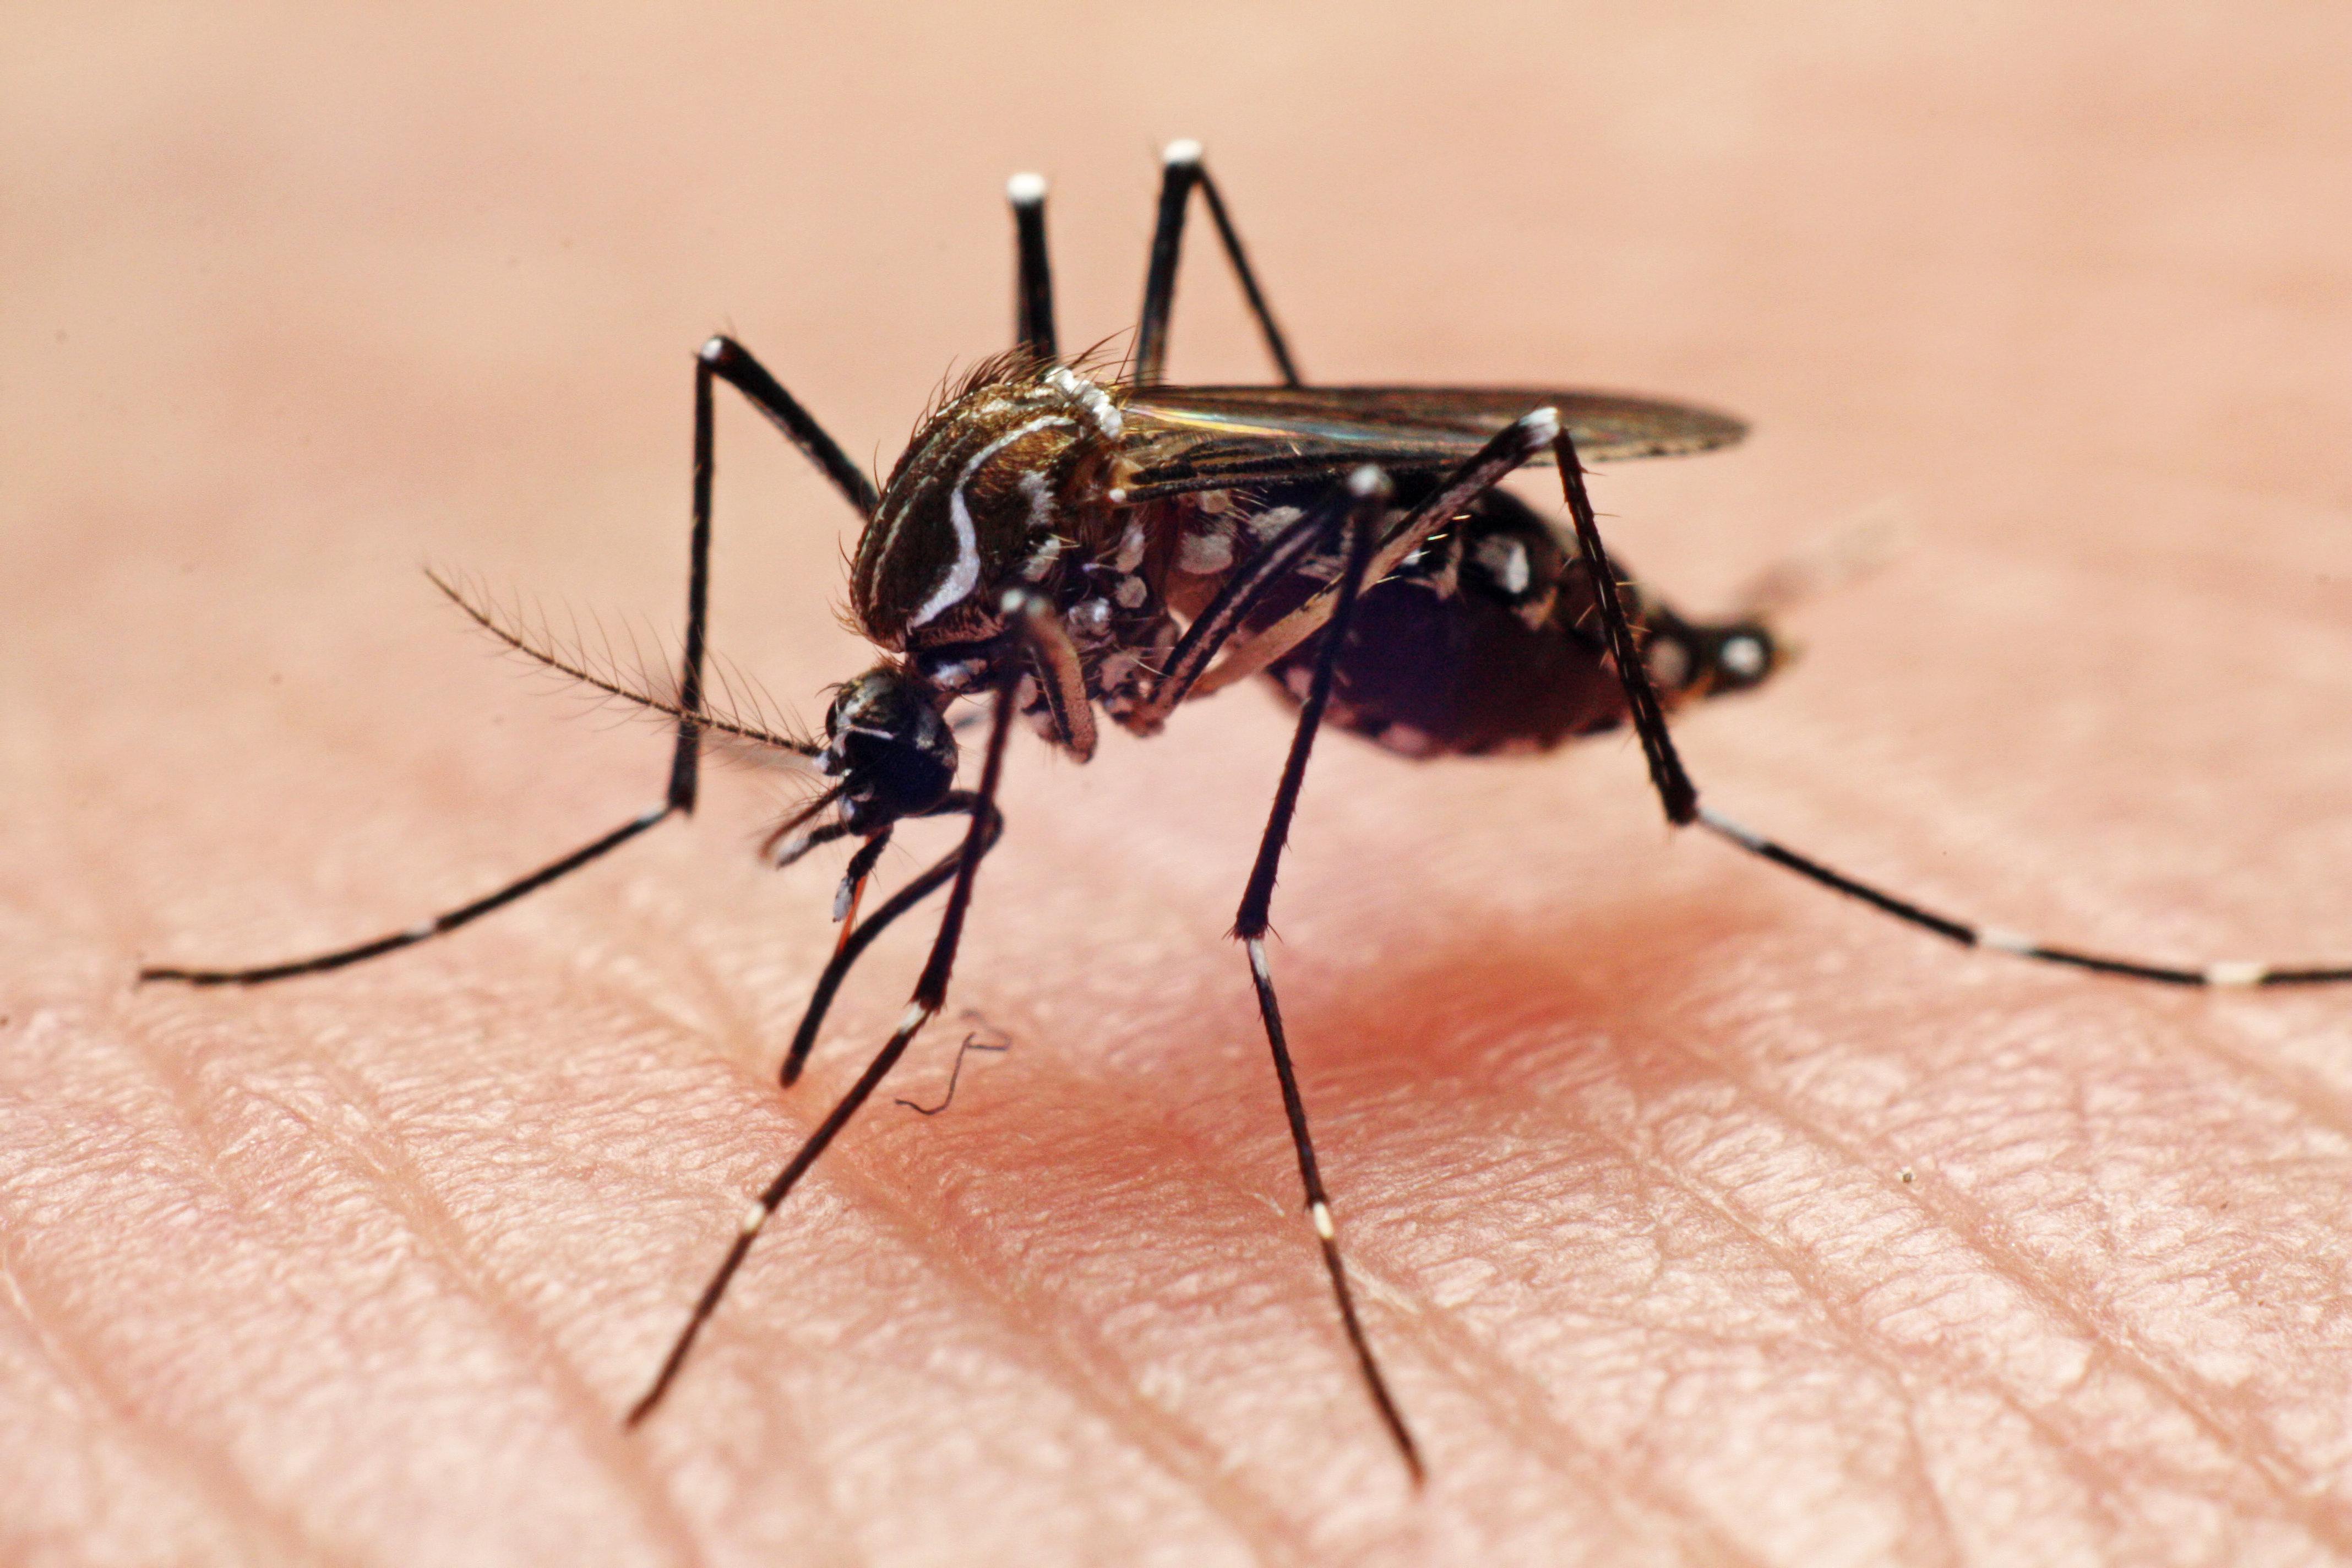 Dengue fever vector, mosquito biting hand.